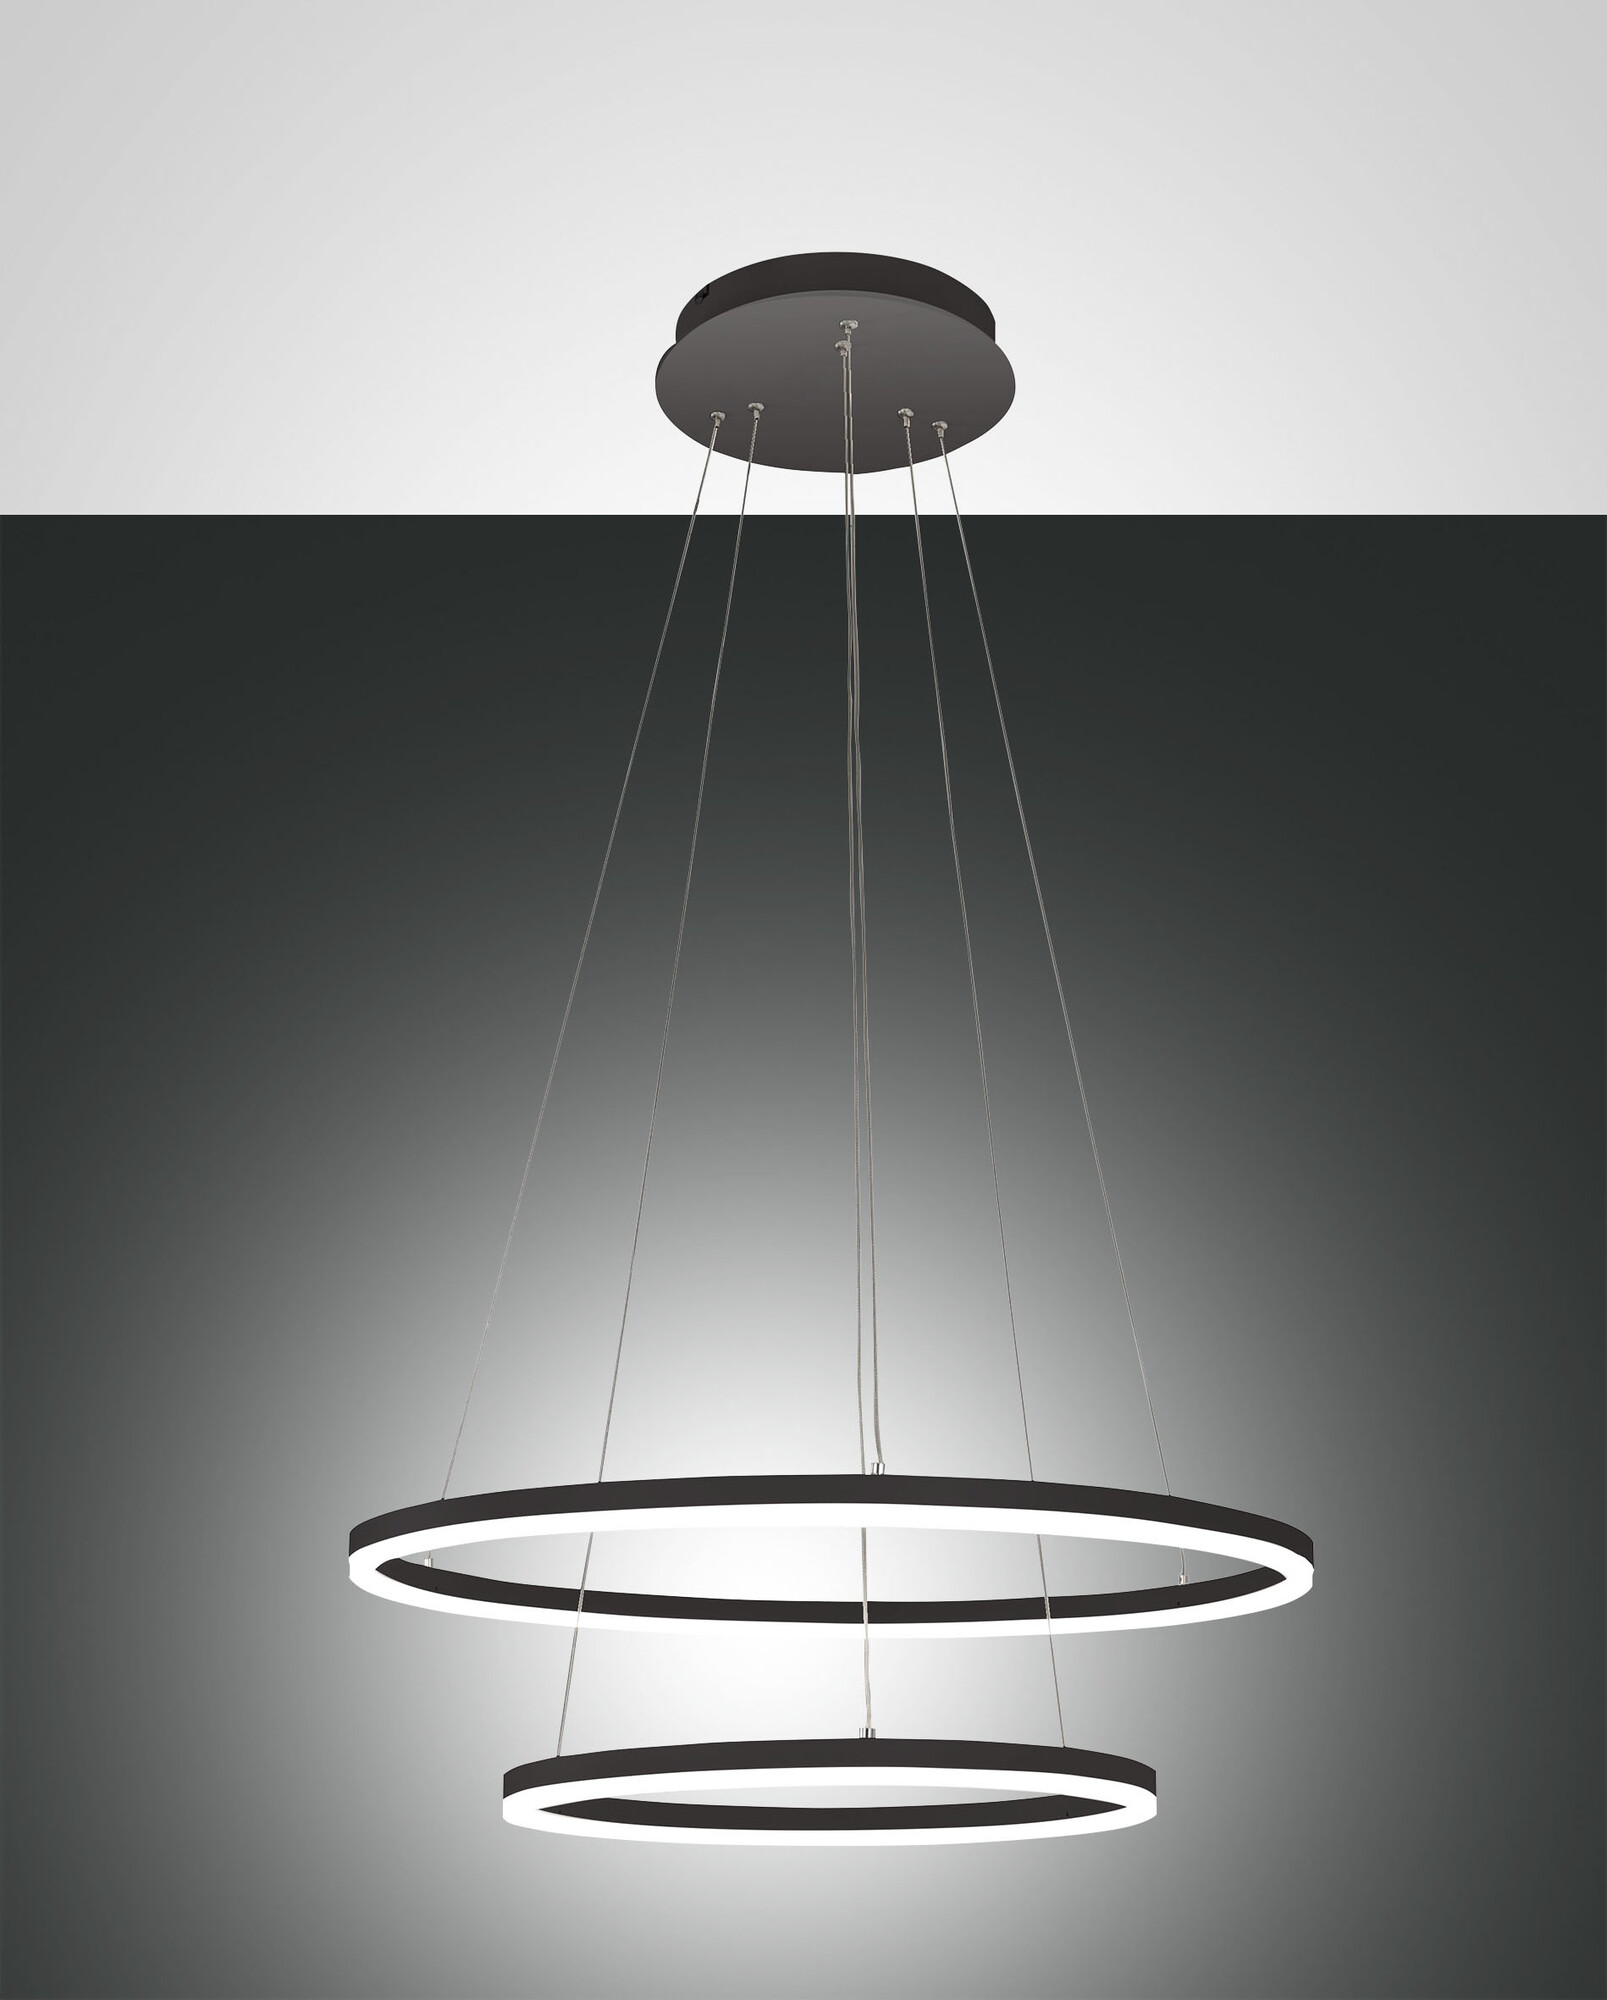 GIOTTO Hanglamp LED 2x52W/4680lm Zwart